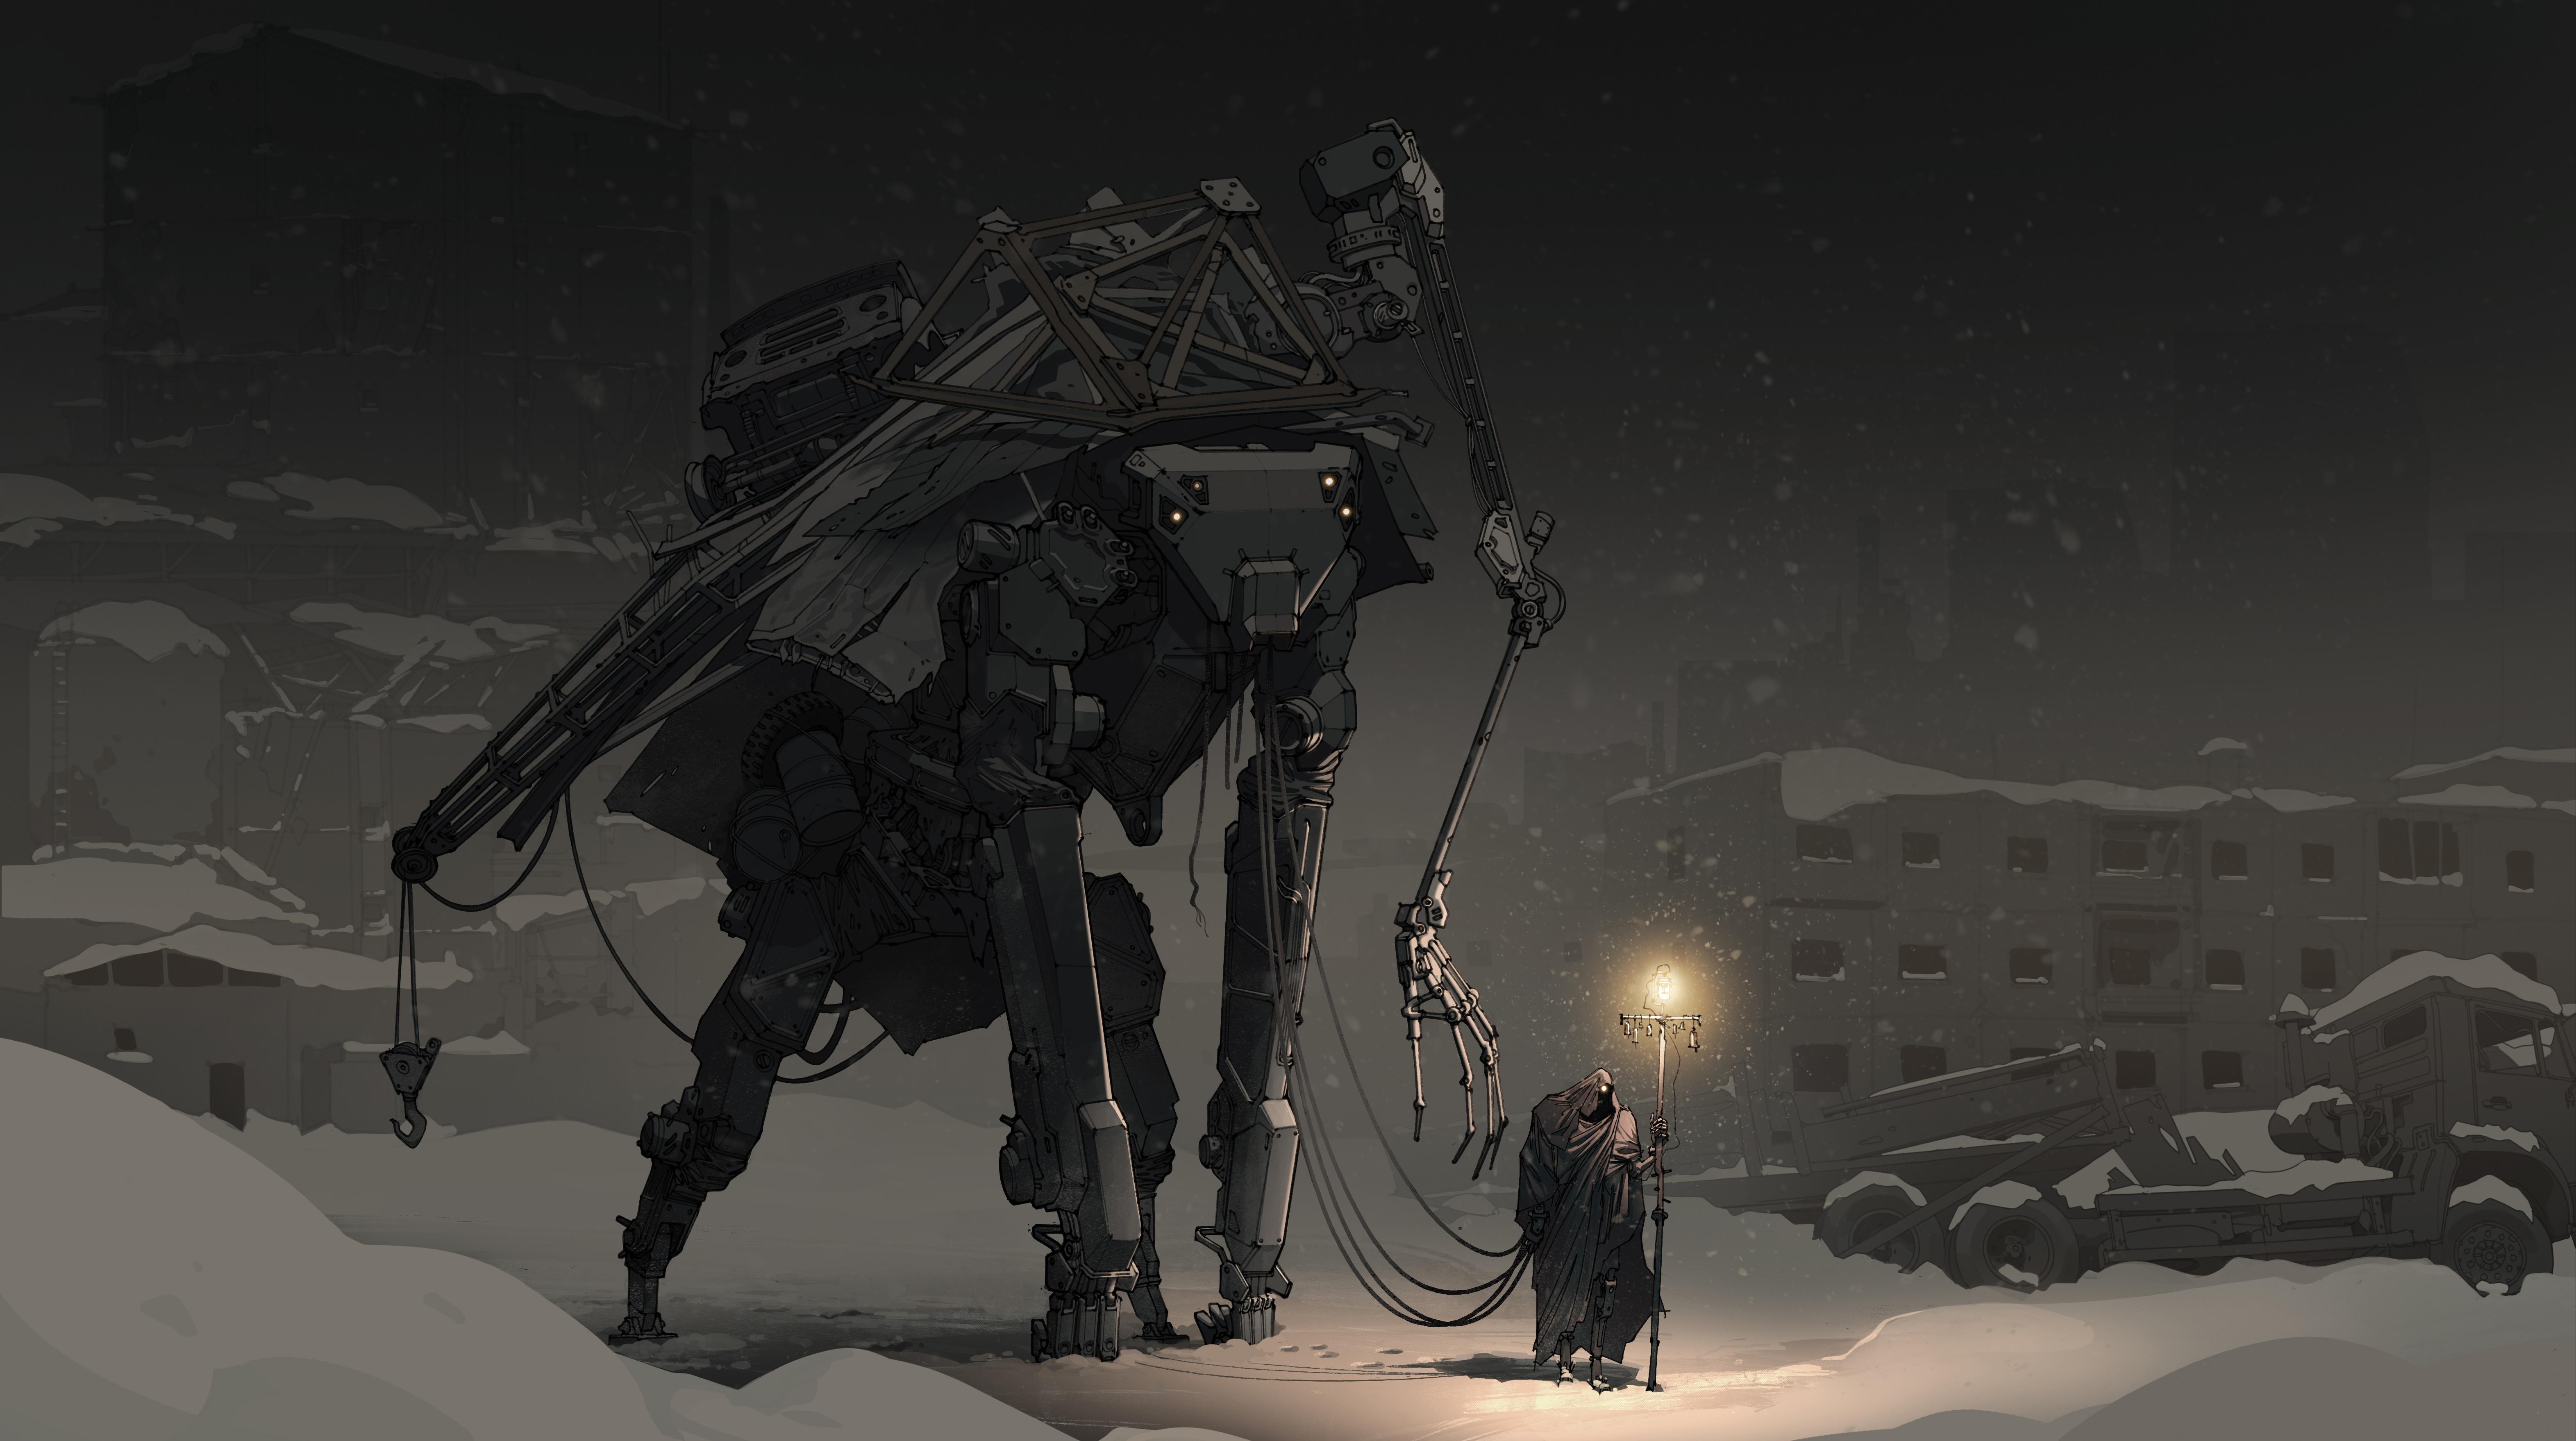 General 6286x3517 robot creepy night Russia city house mist faded dark snow winter traveller